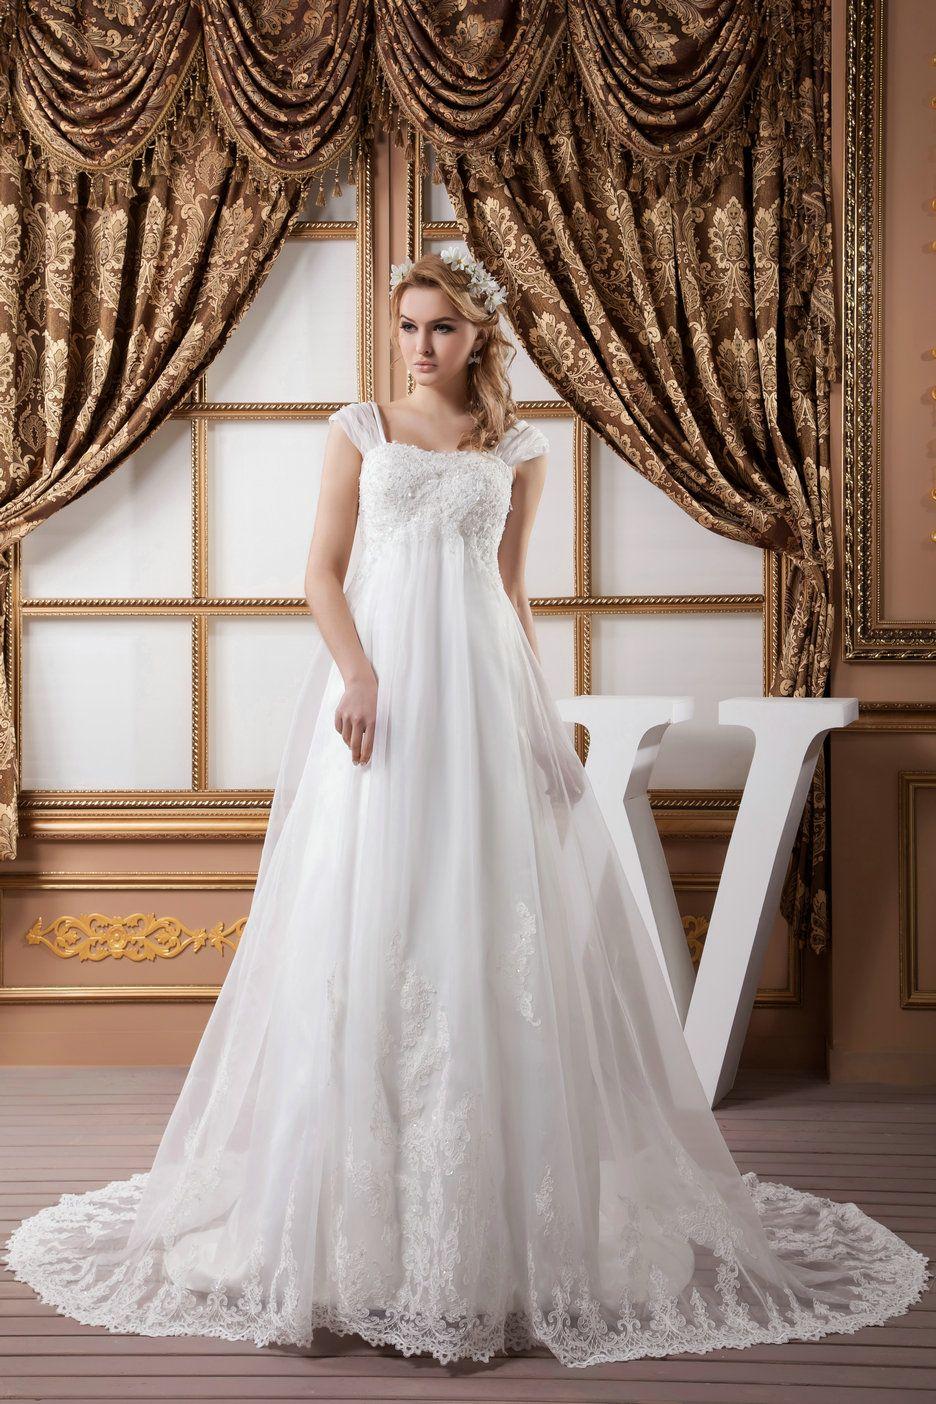 Empire waist dress wedding dress plus size google search for Plus size empire wedding dress